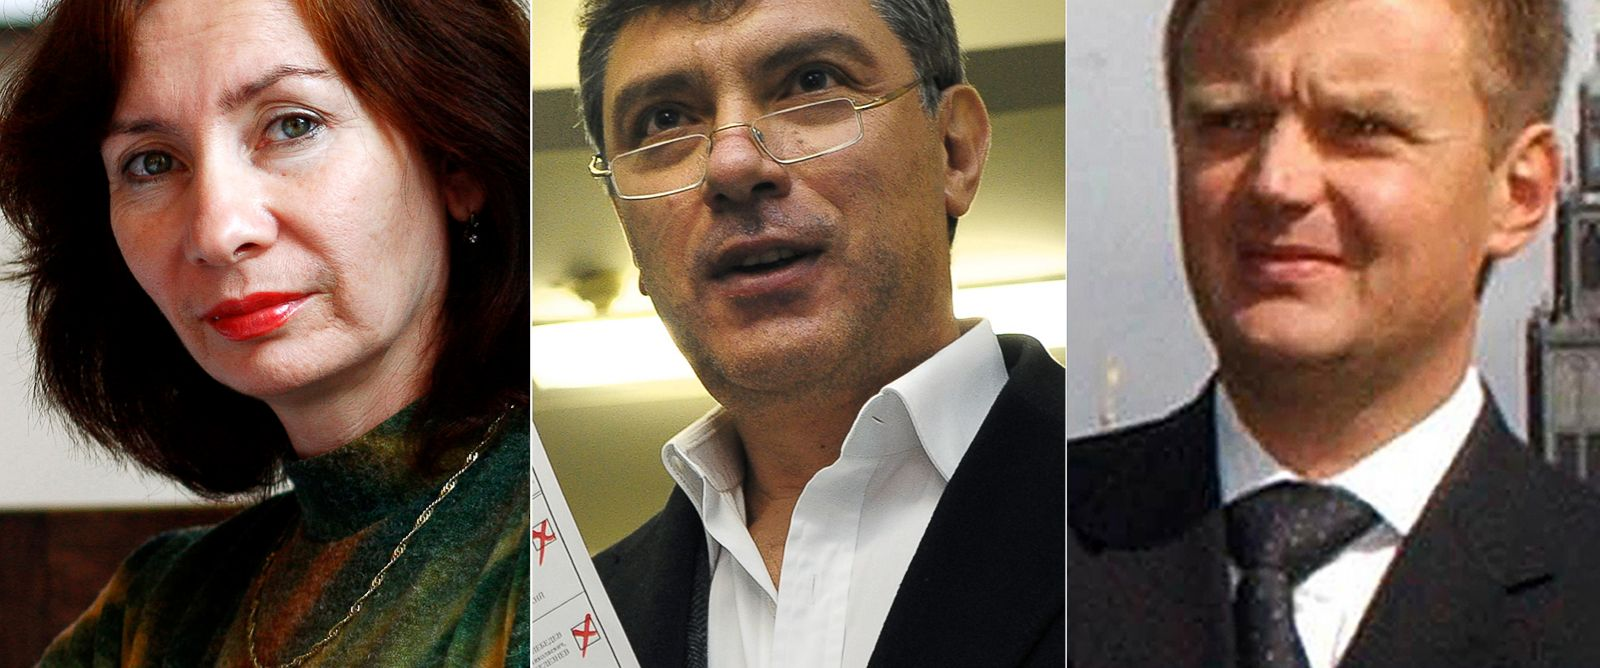 PHOTO: Natalia Estemirova | Boris Nemtsov | Alexander Litvinenko